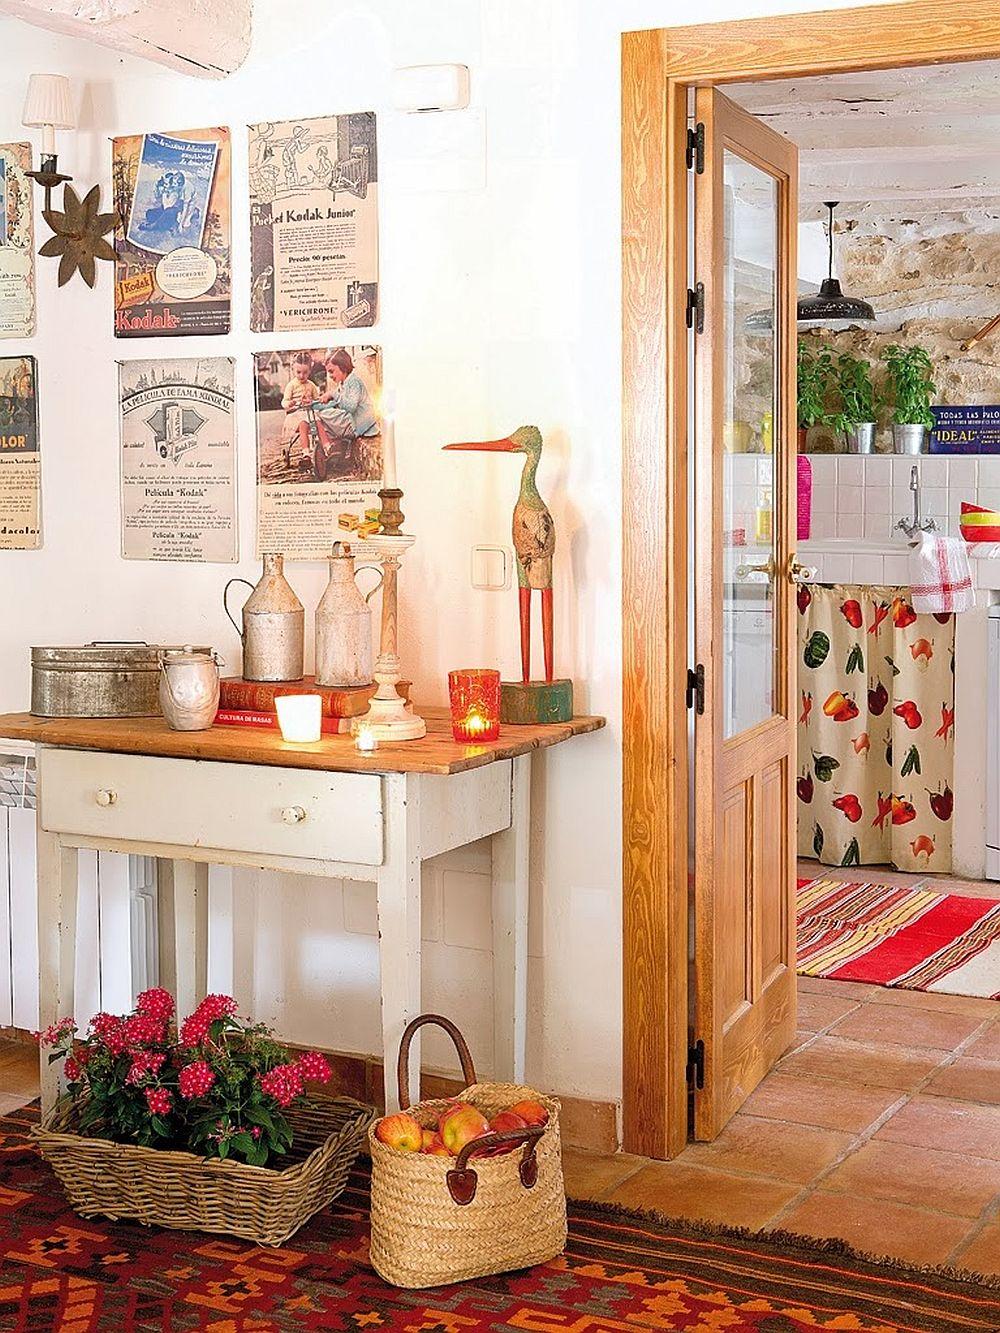 adelaparvu.com about rustic home designers Lola Rodríguez and Eugenia Mateos Photo Micasa (8)